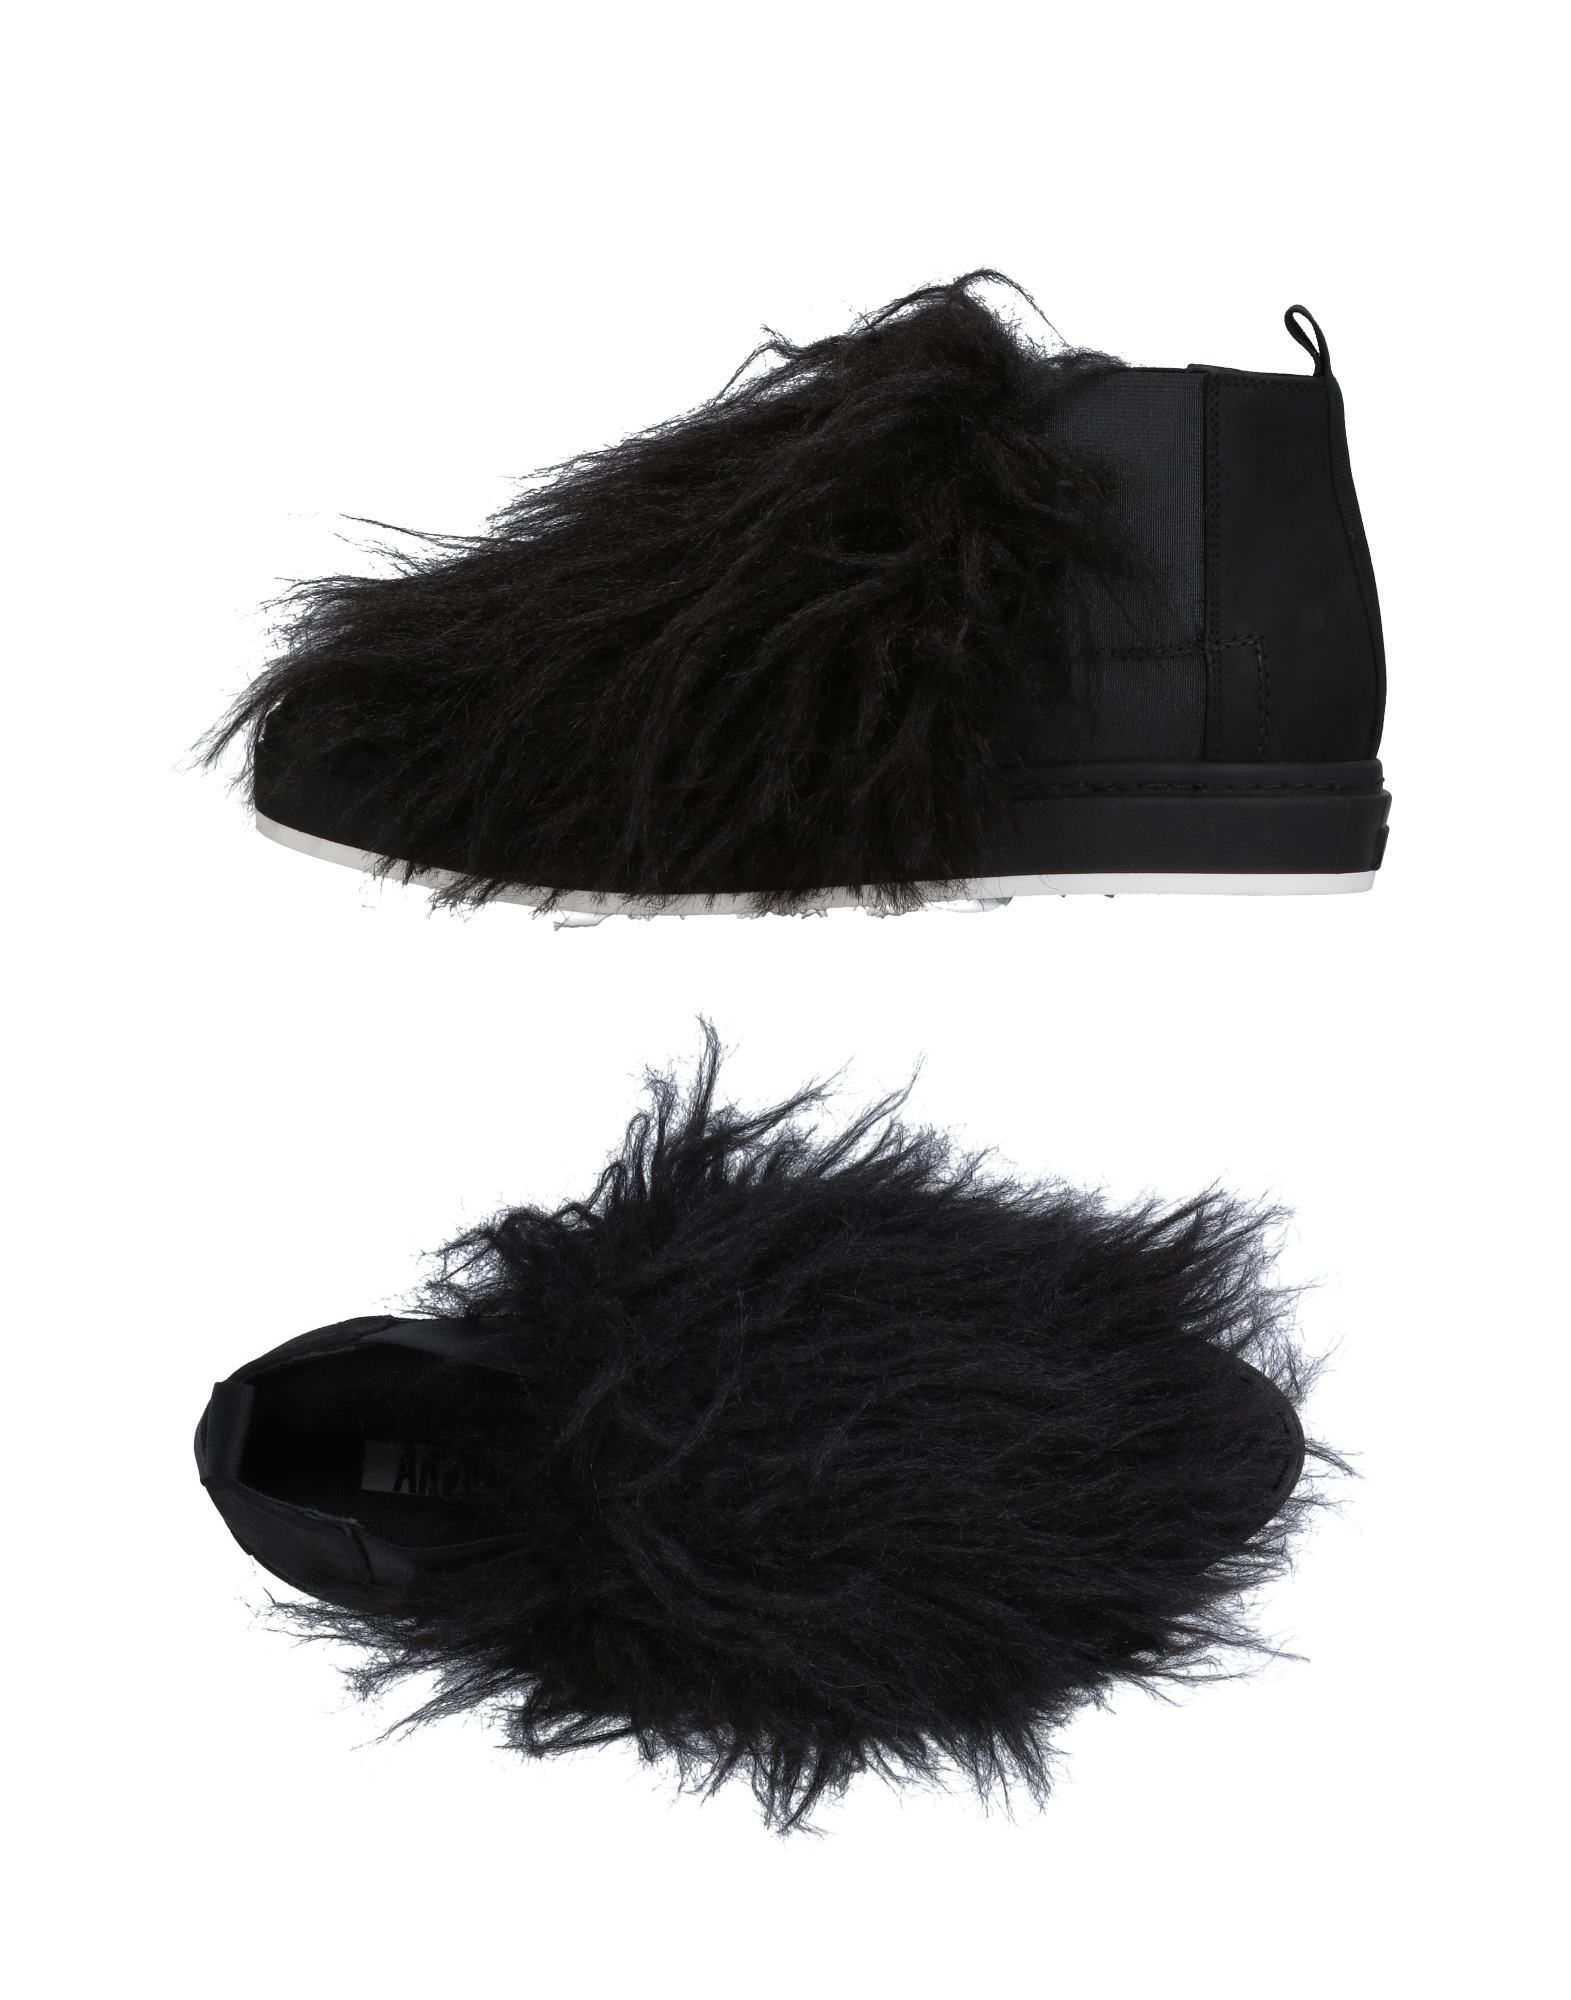 Shy By Arvid Yuki Sneakers Arvid - Women Shy By Arvid Sneakers Yuki Sneakers online on  United Kingdom - 11324654LR 1e9105